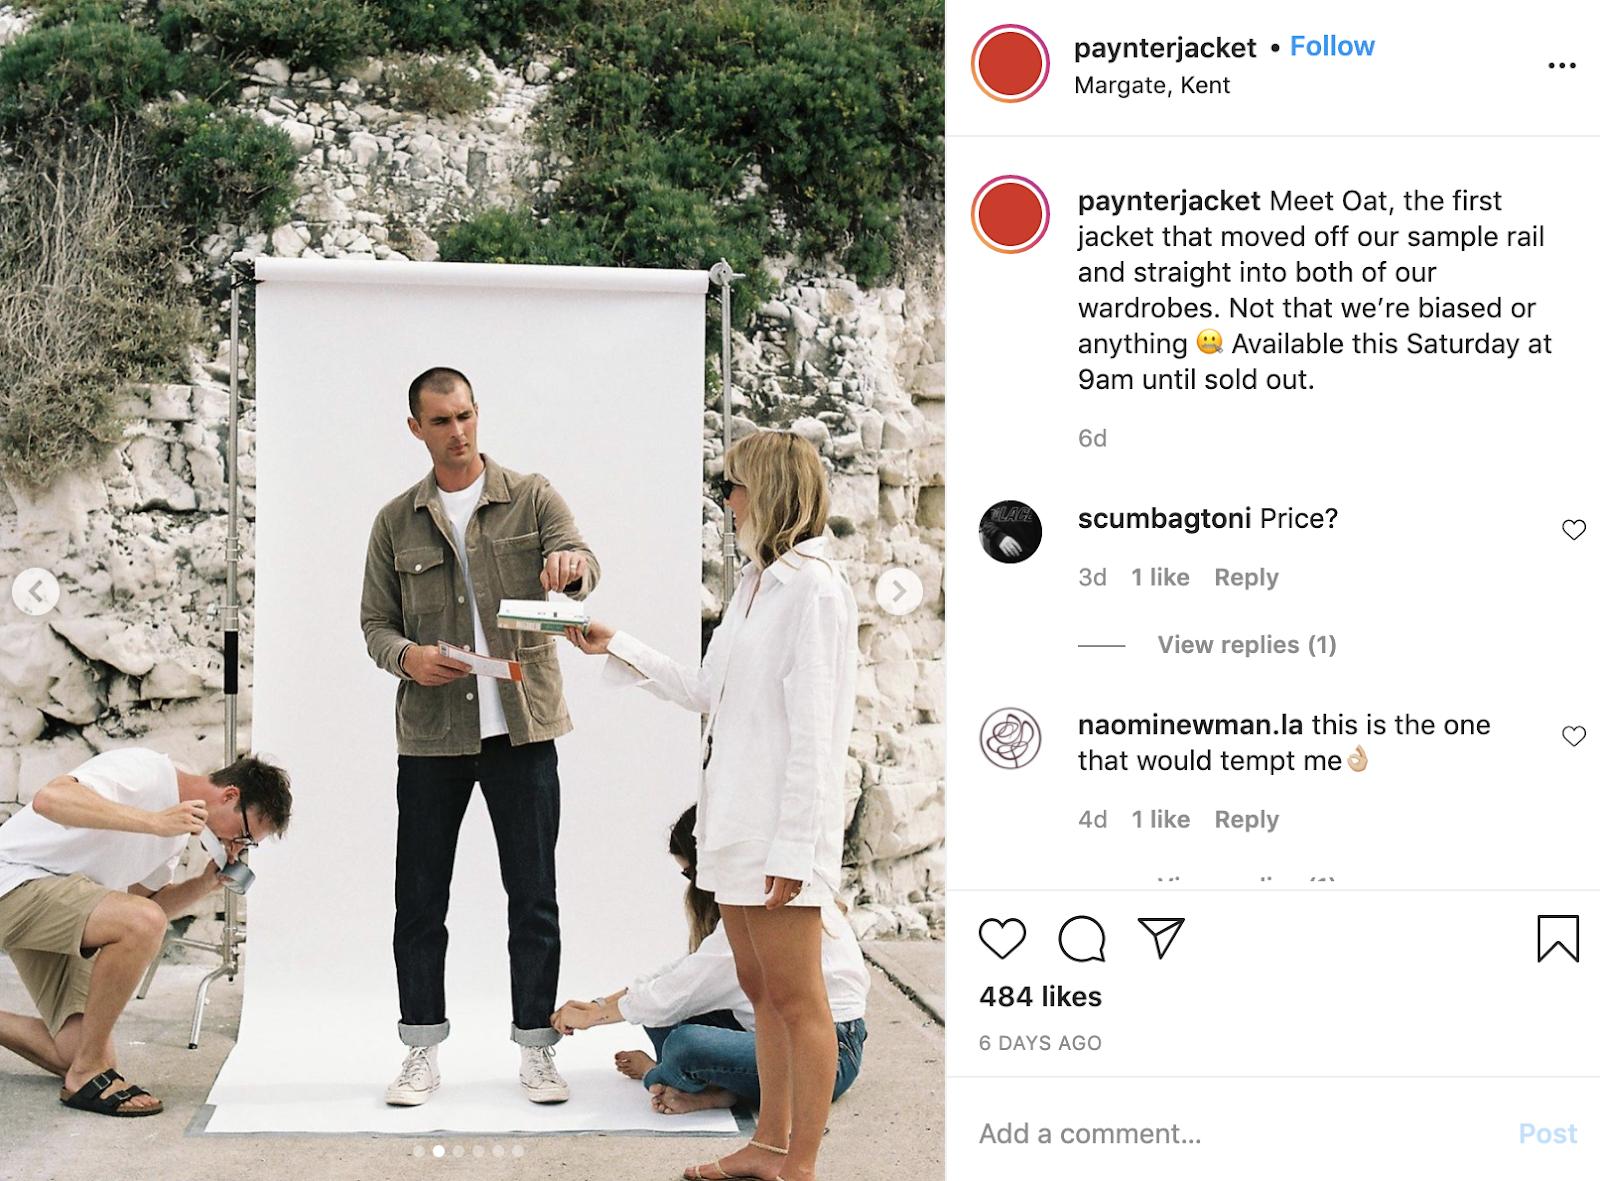 Instagram post by Paynter Jacket